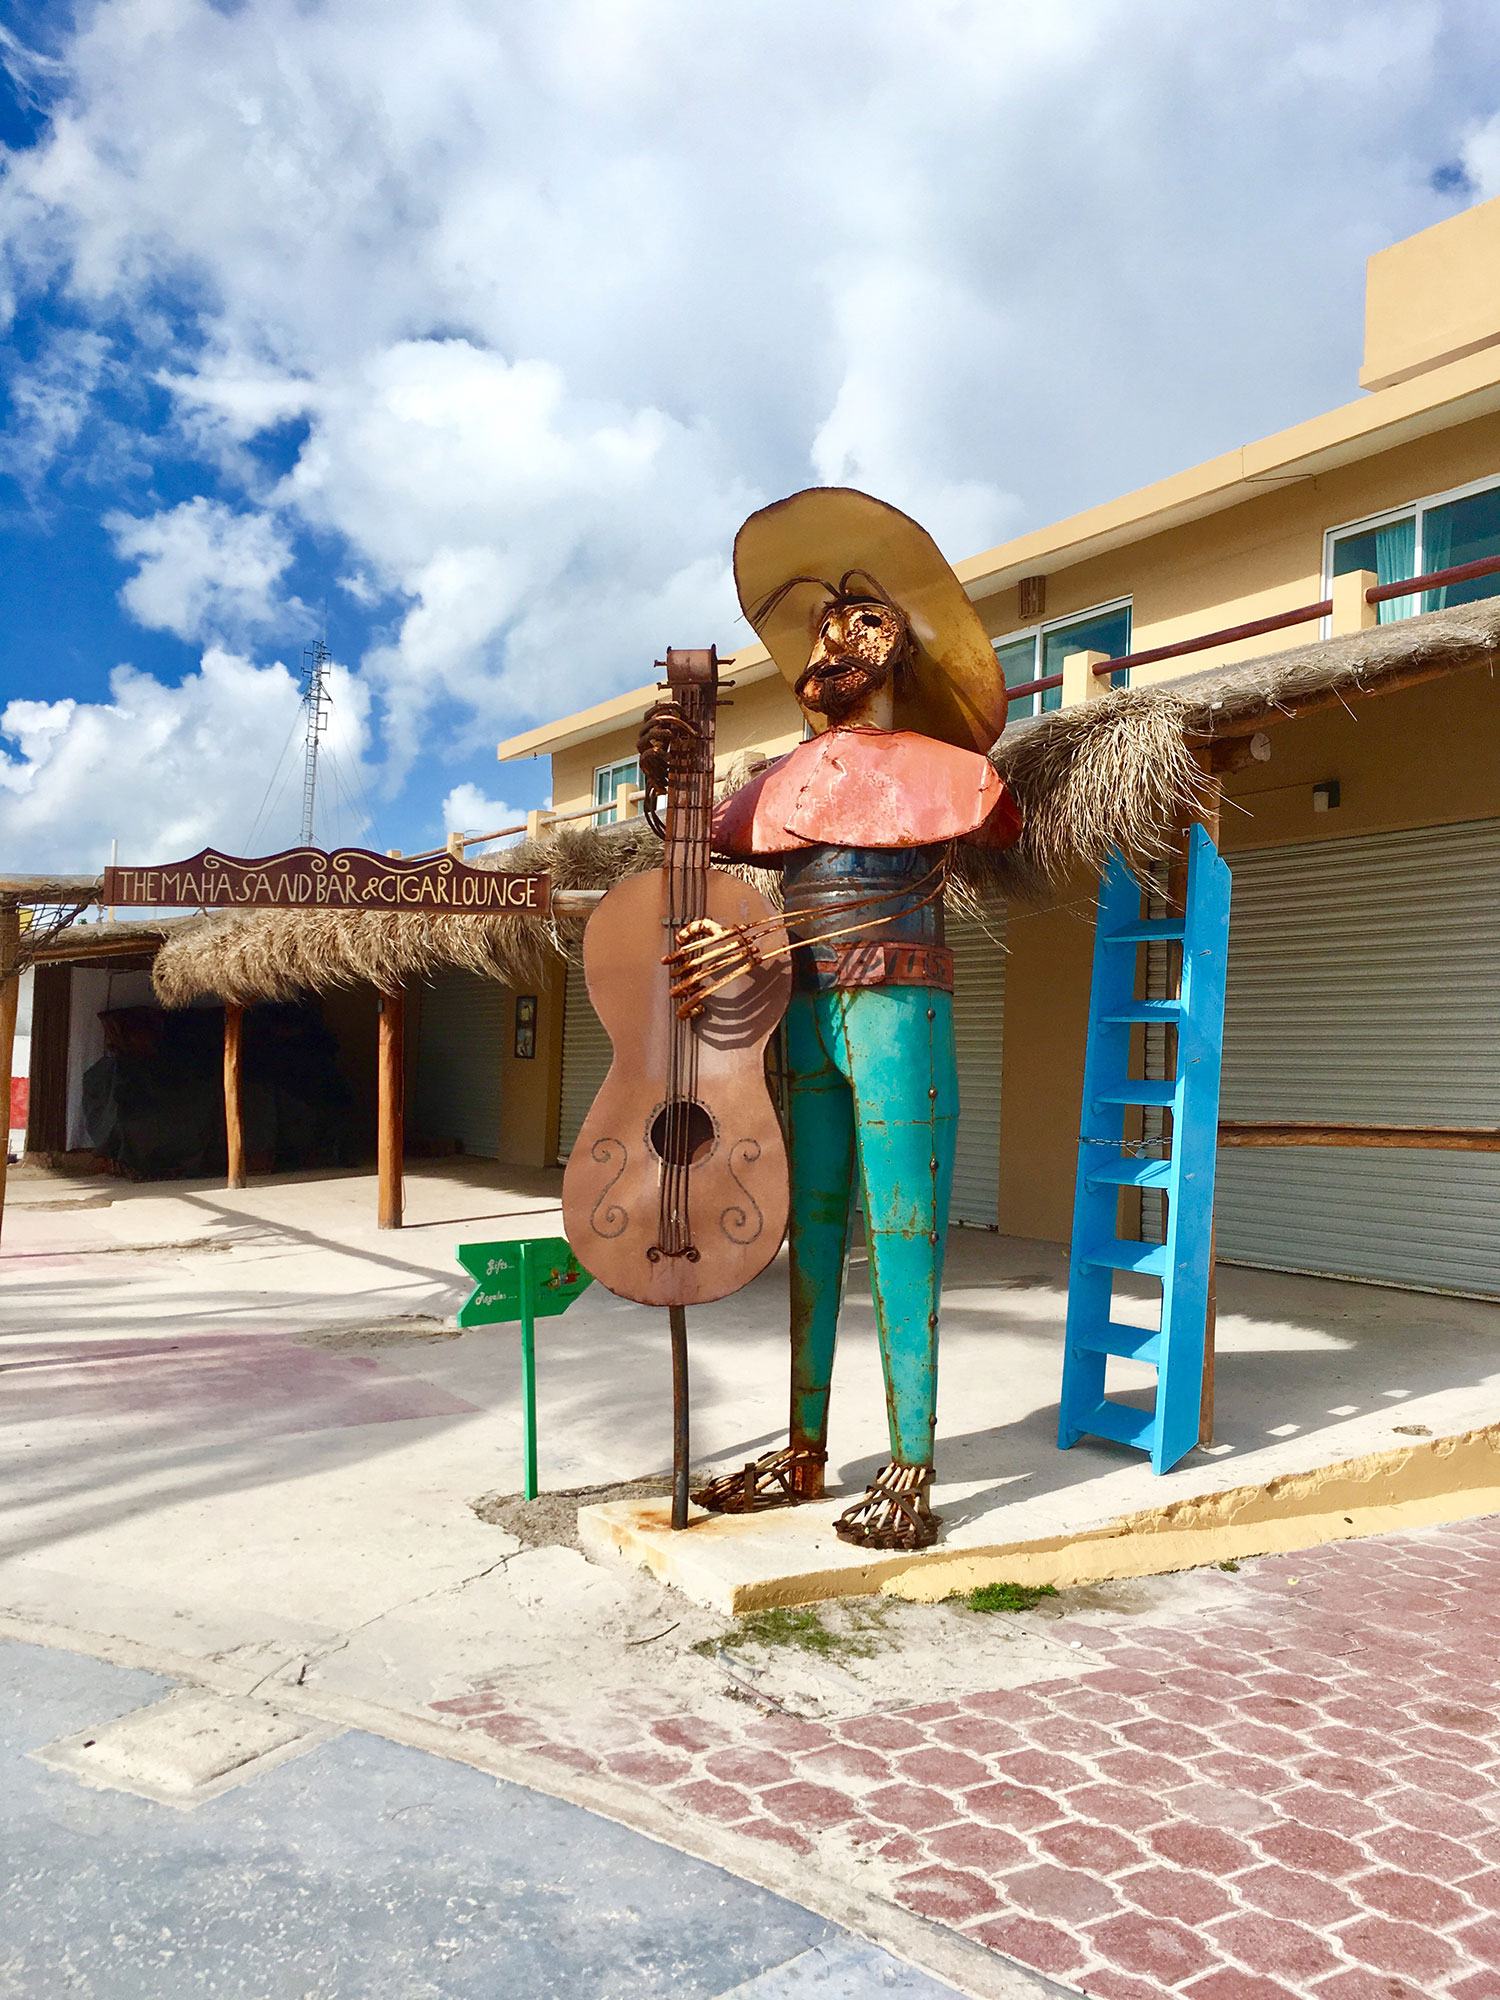 Hammocks_and_Ruins_What_to_Do_Yucatan_Mexico_beach_Costa_Maya_31.jpg